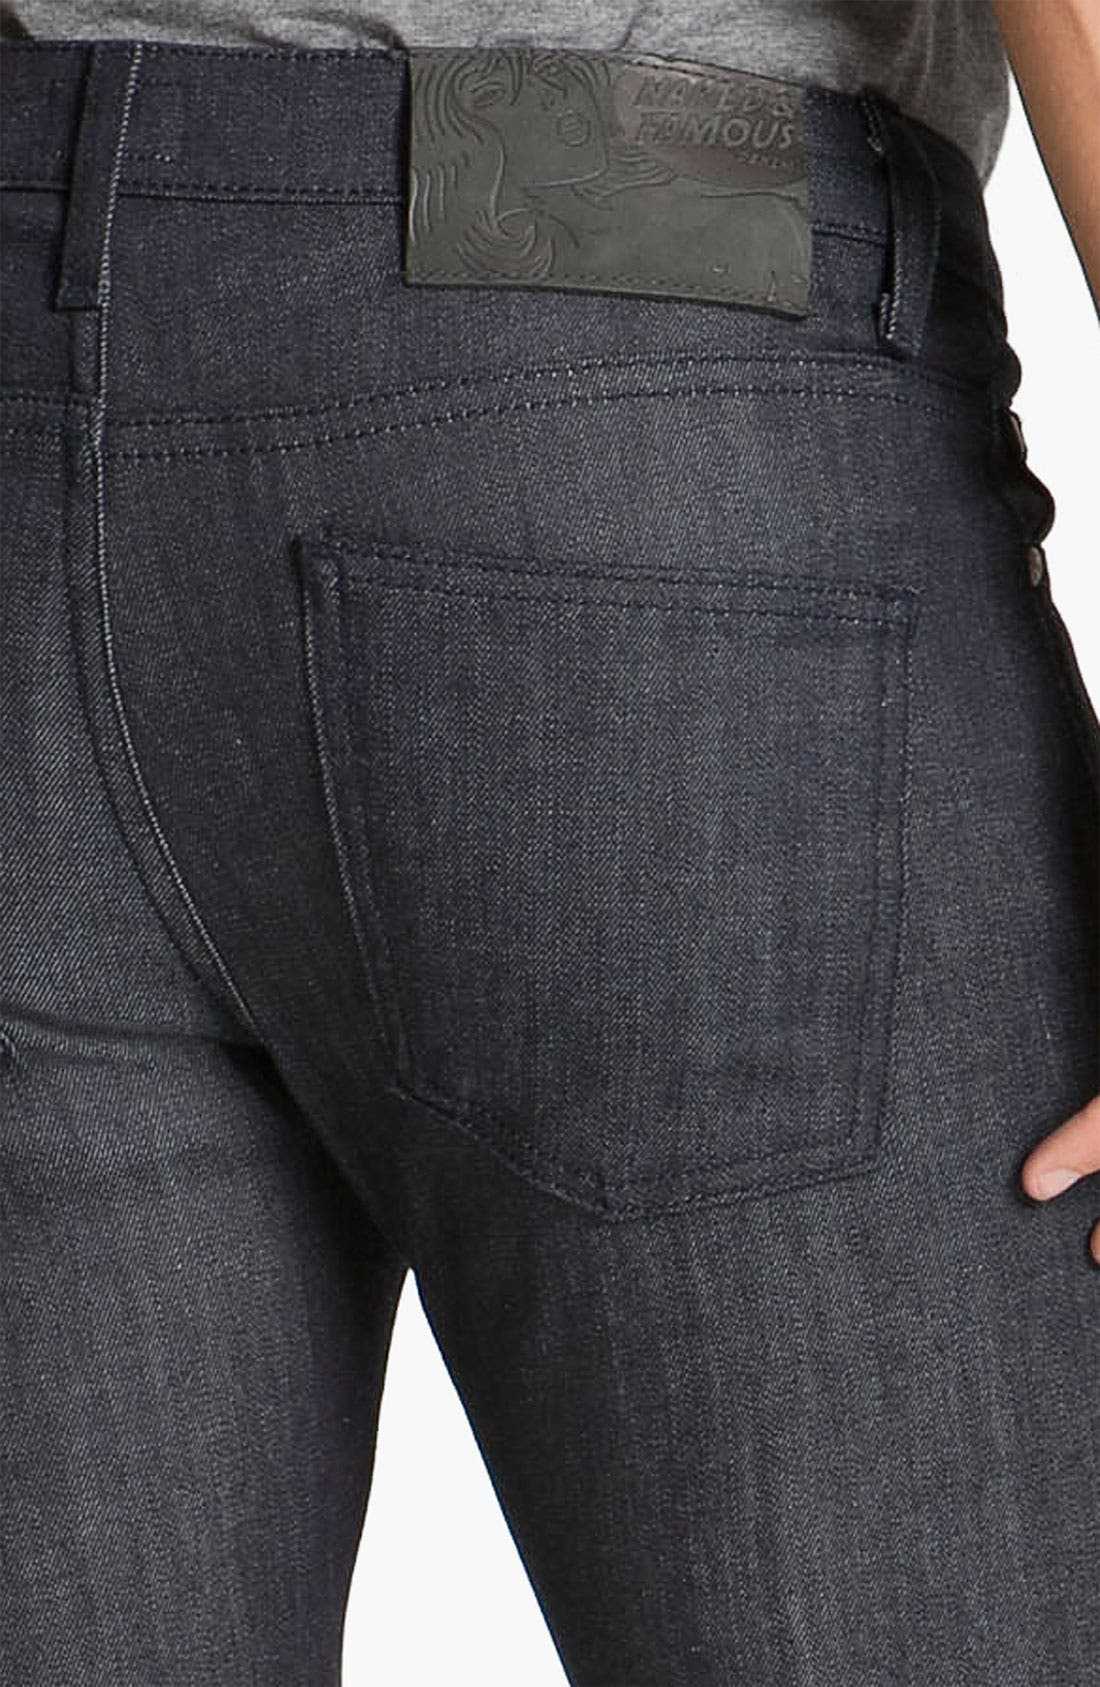 Alternate Image 4  - Naked & Famous Denim 'Skinny Guy' Slim Cotton Cashmere Skinny Leg Jeans (Dark Indigo)